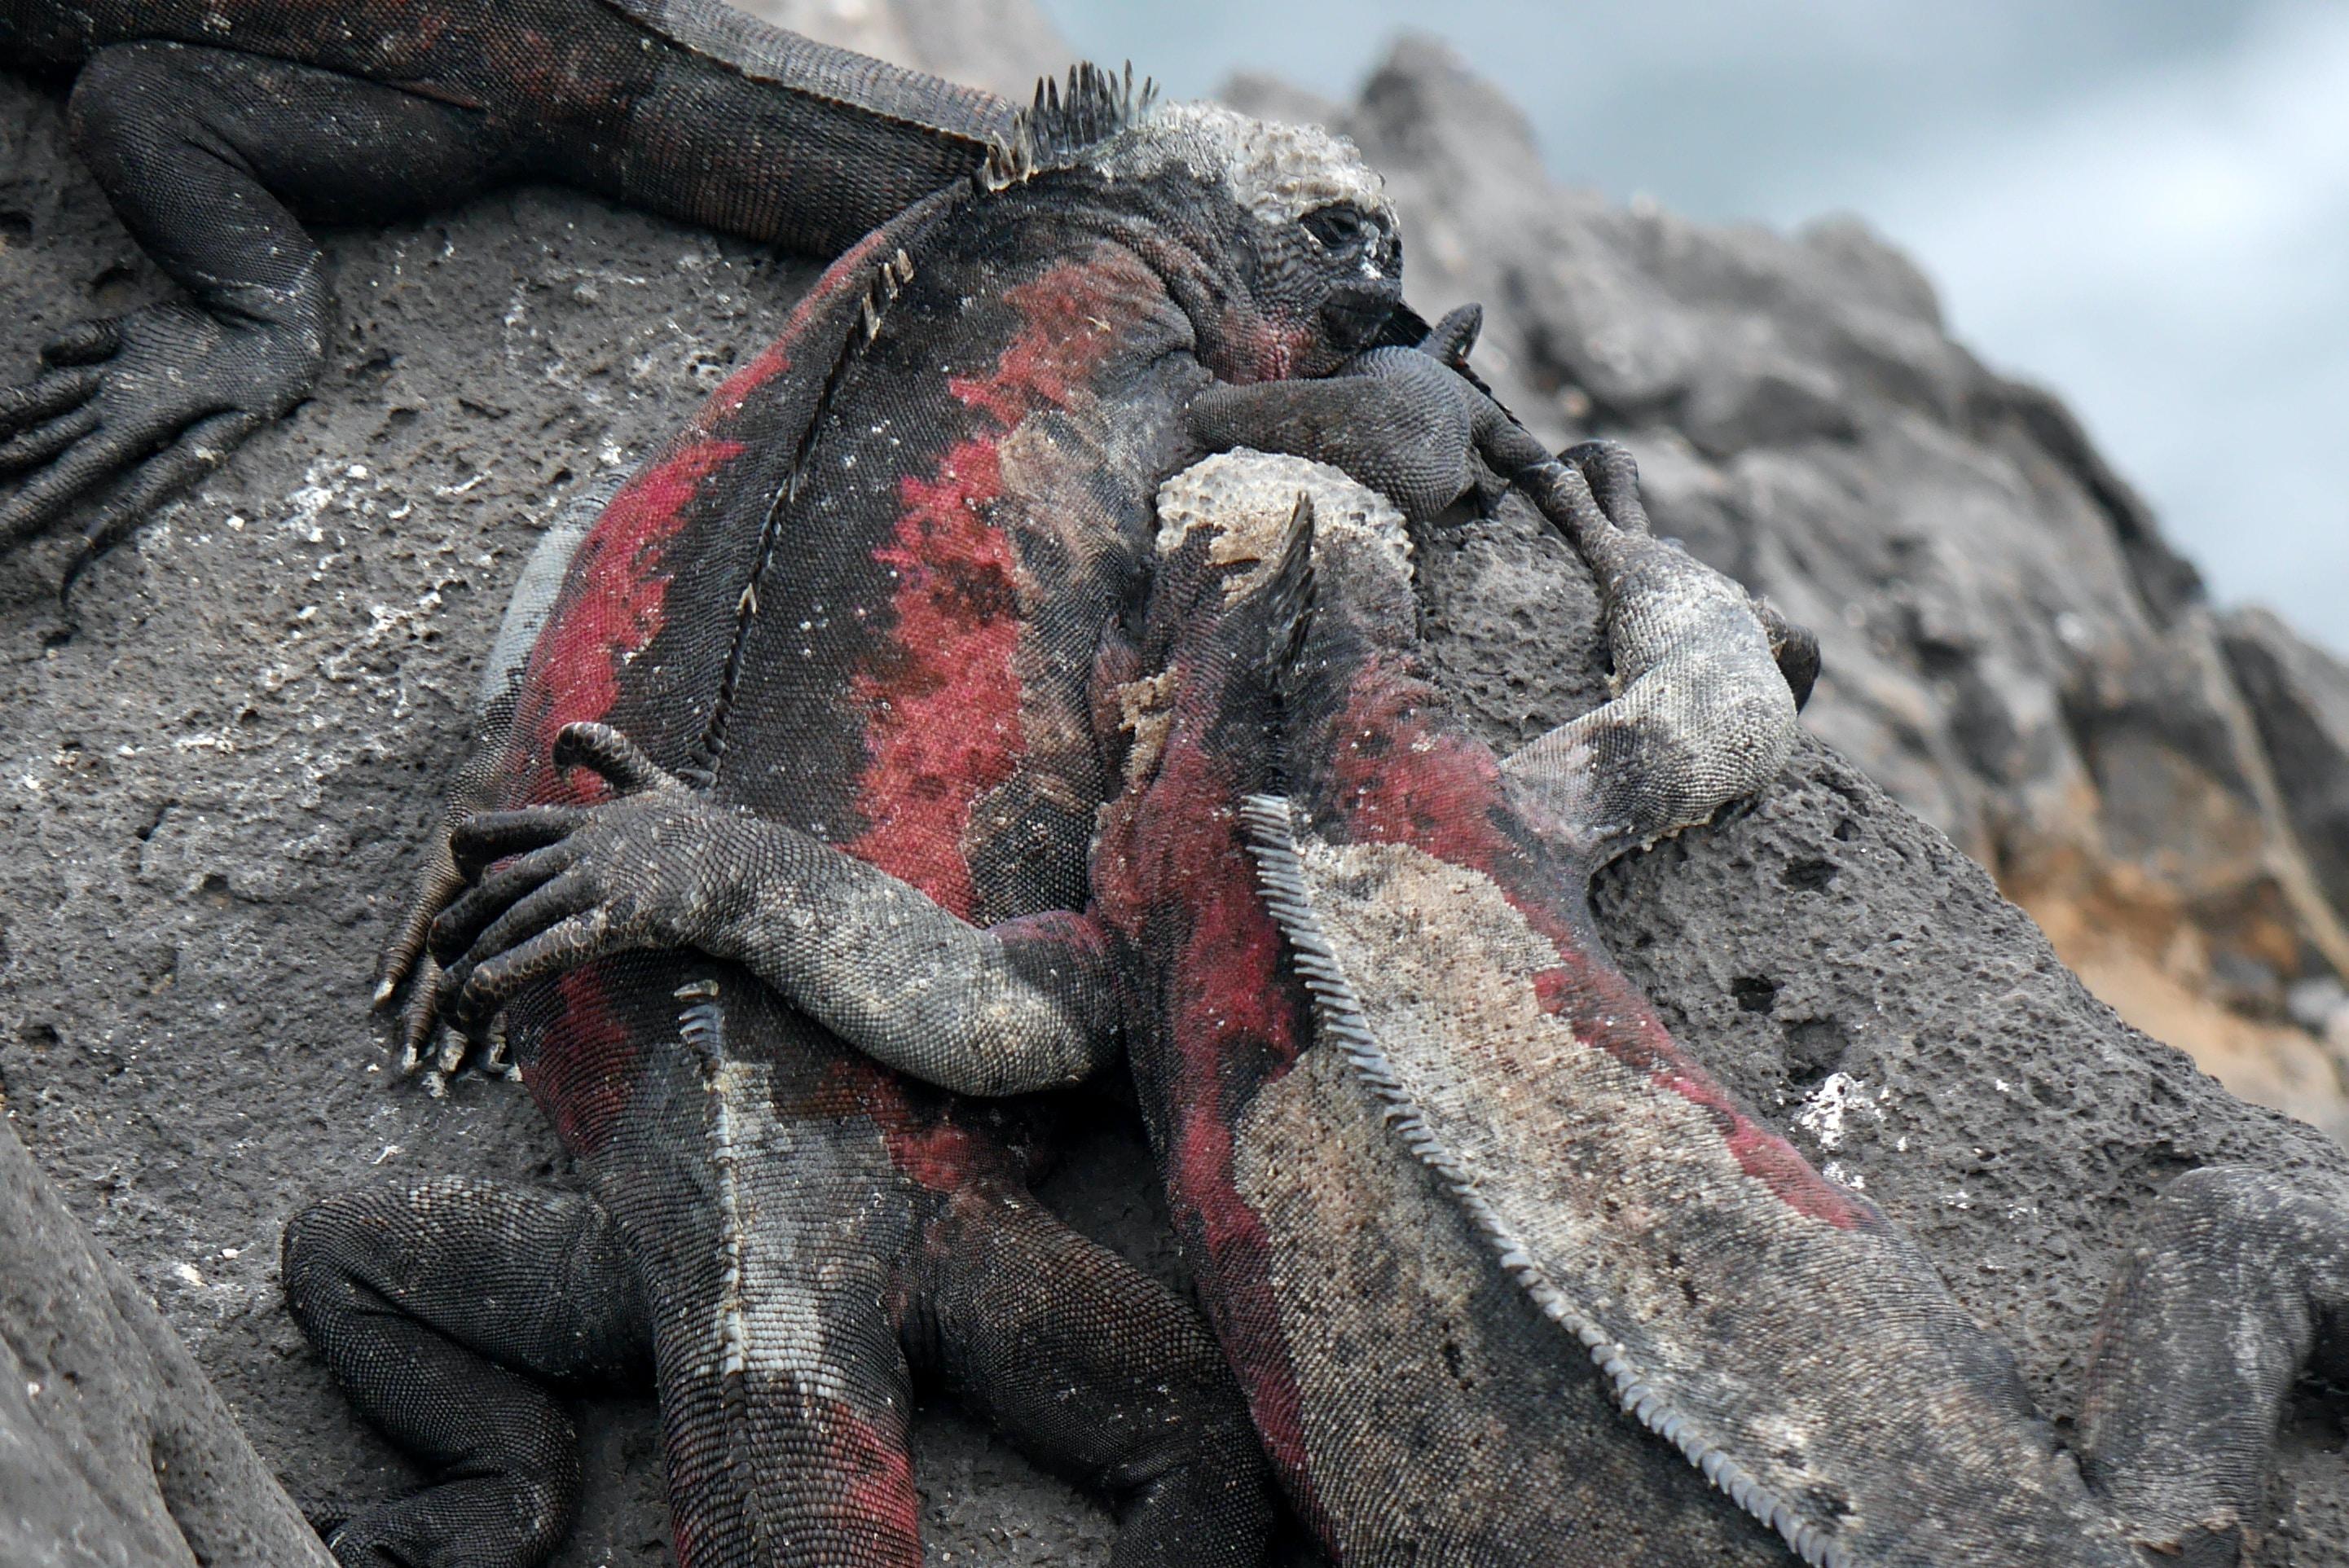 close-up photography of three iguanas on rock